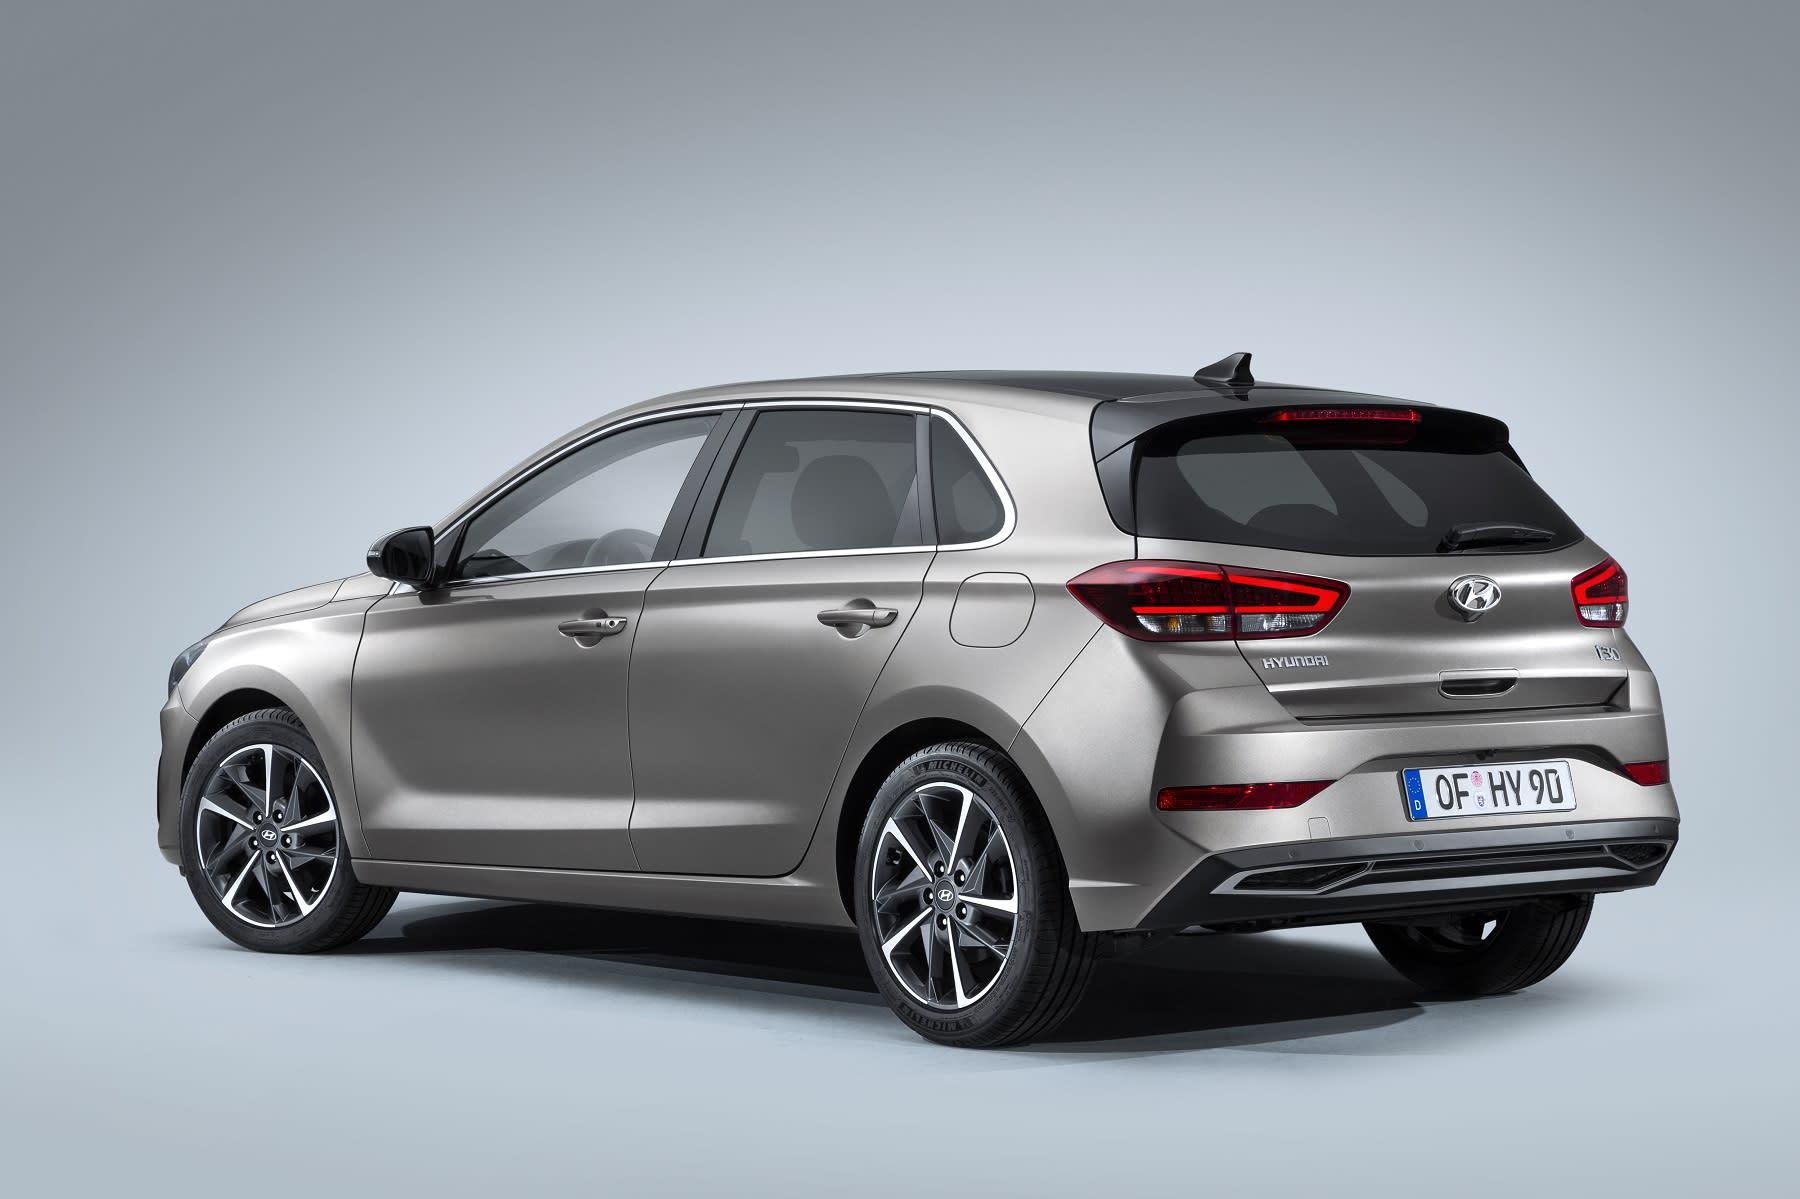 2020日內瓦車展—精銳盡出 Hyundai i30 Hatchback / Fastback / Wagon